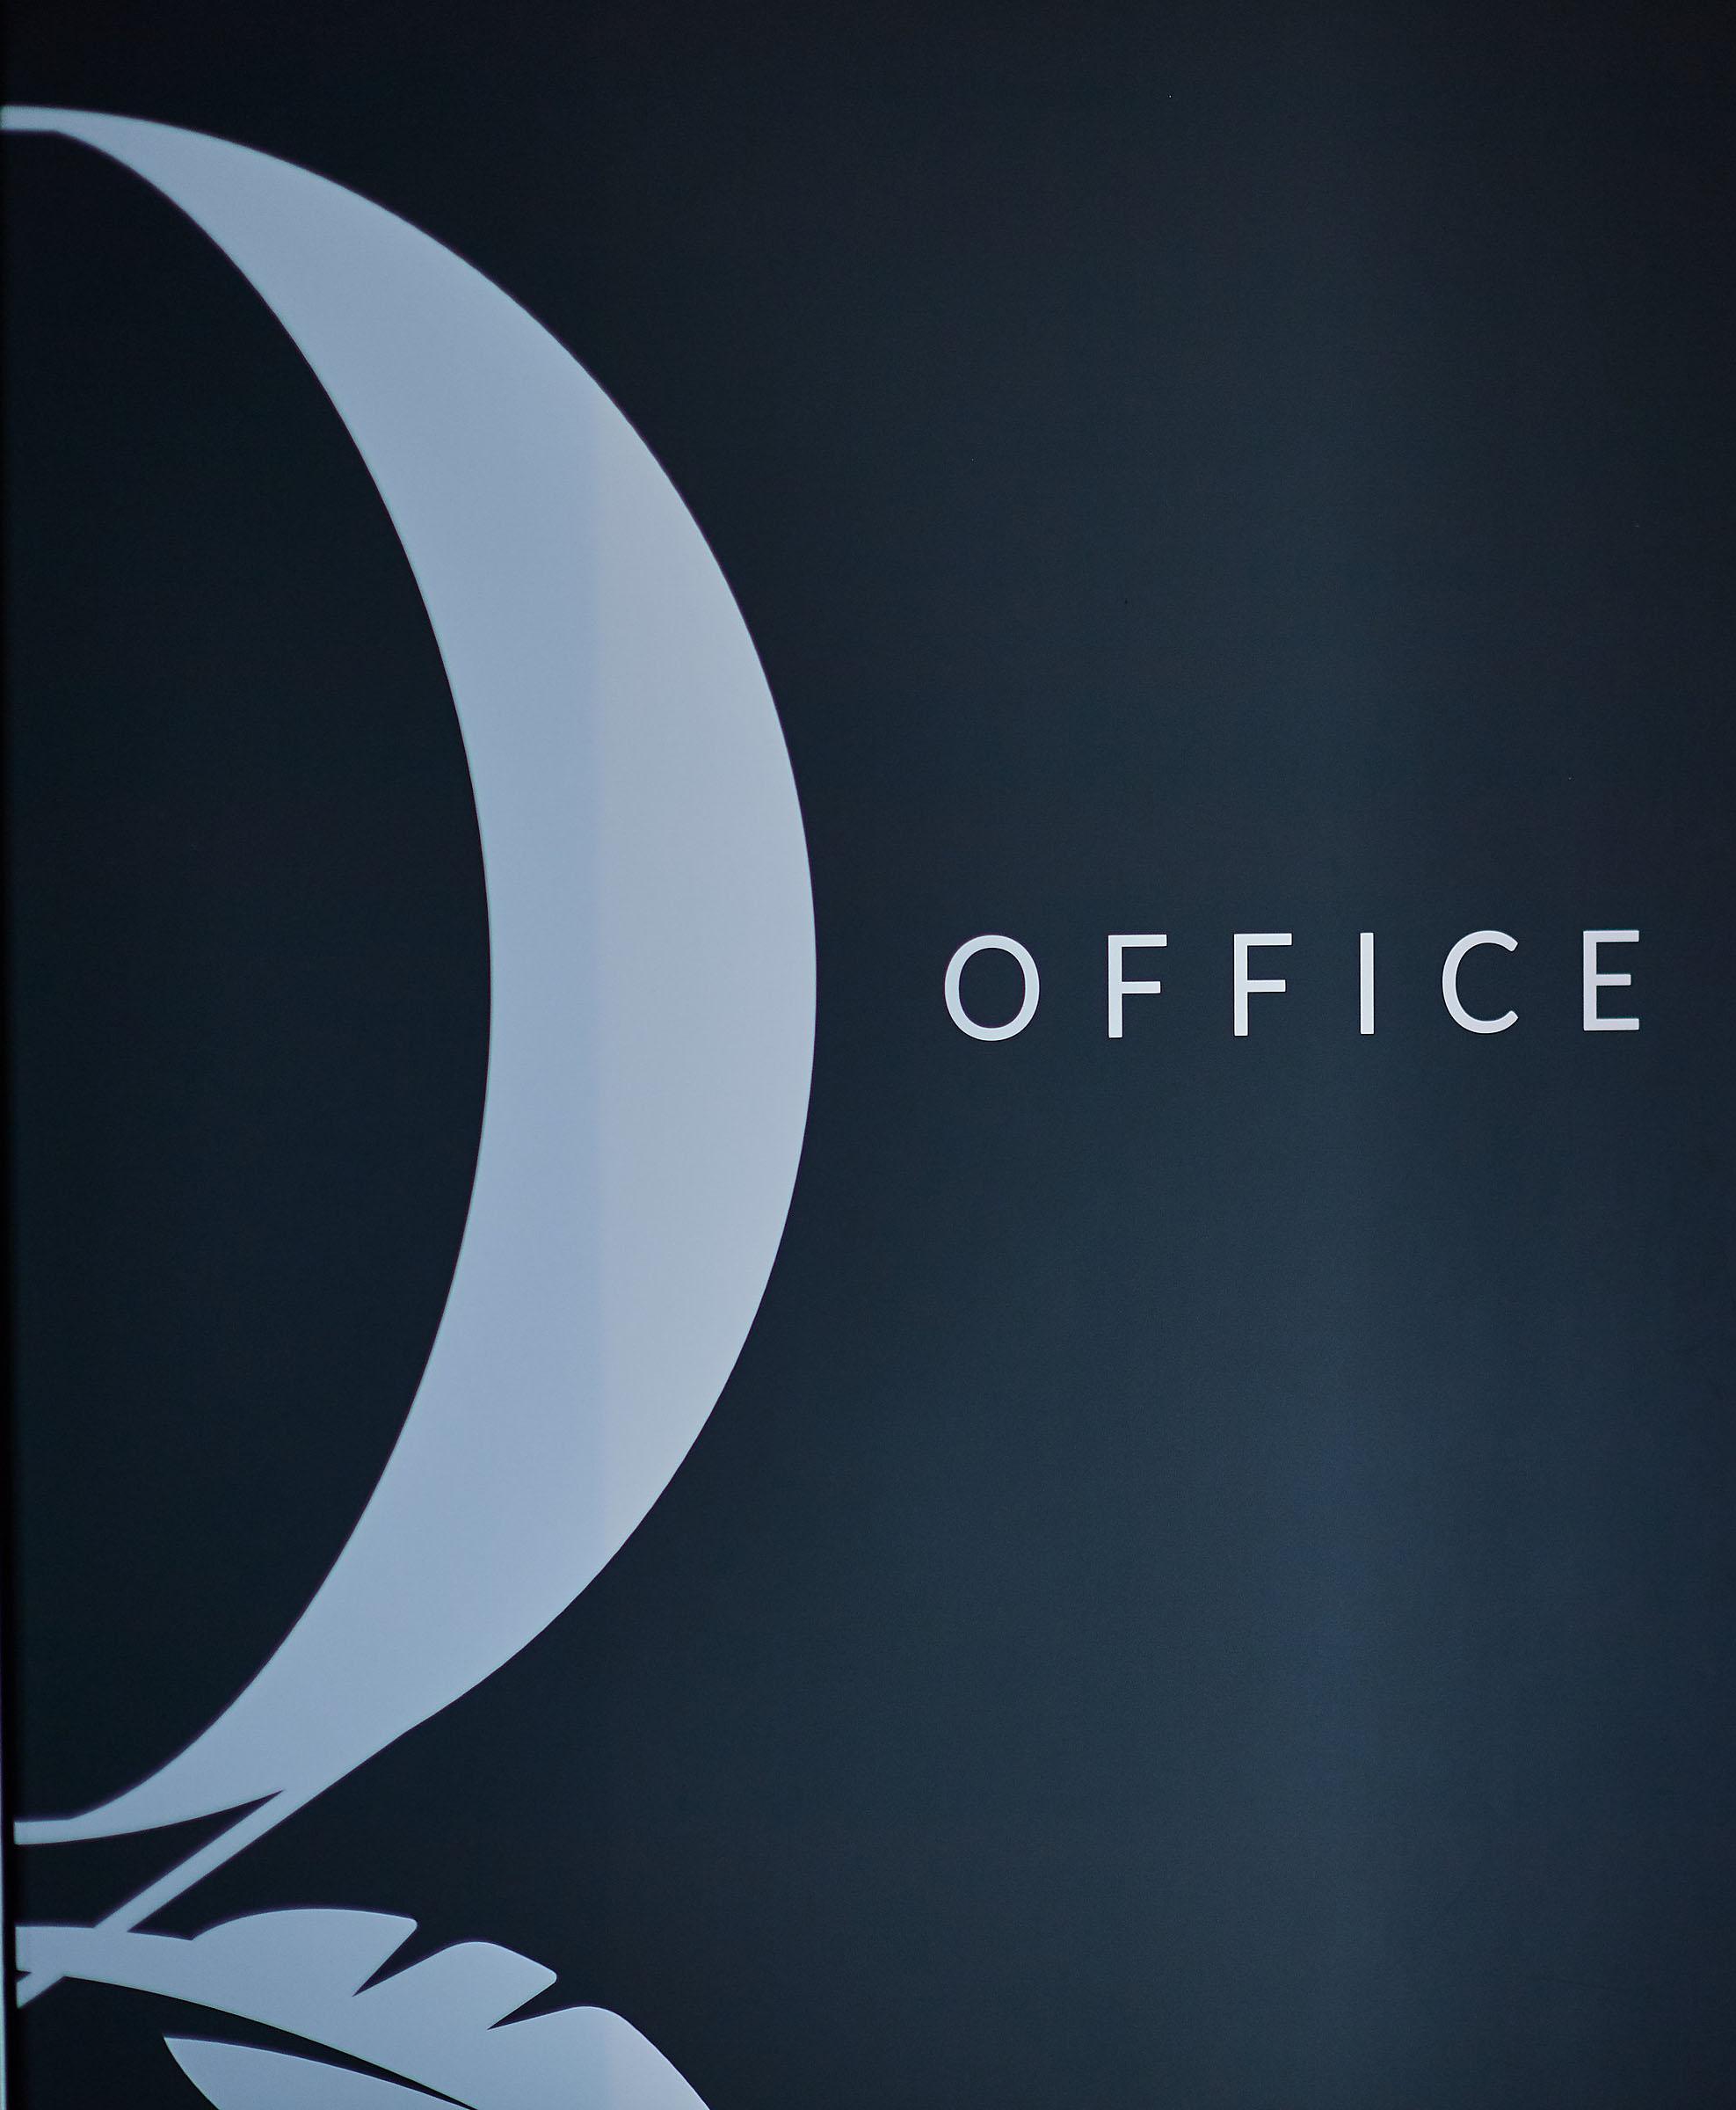 QP-office.jpg